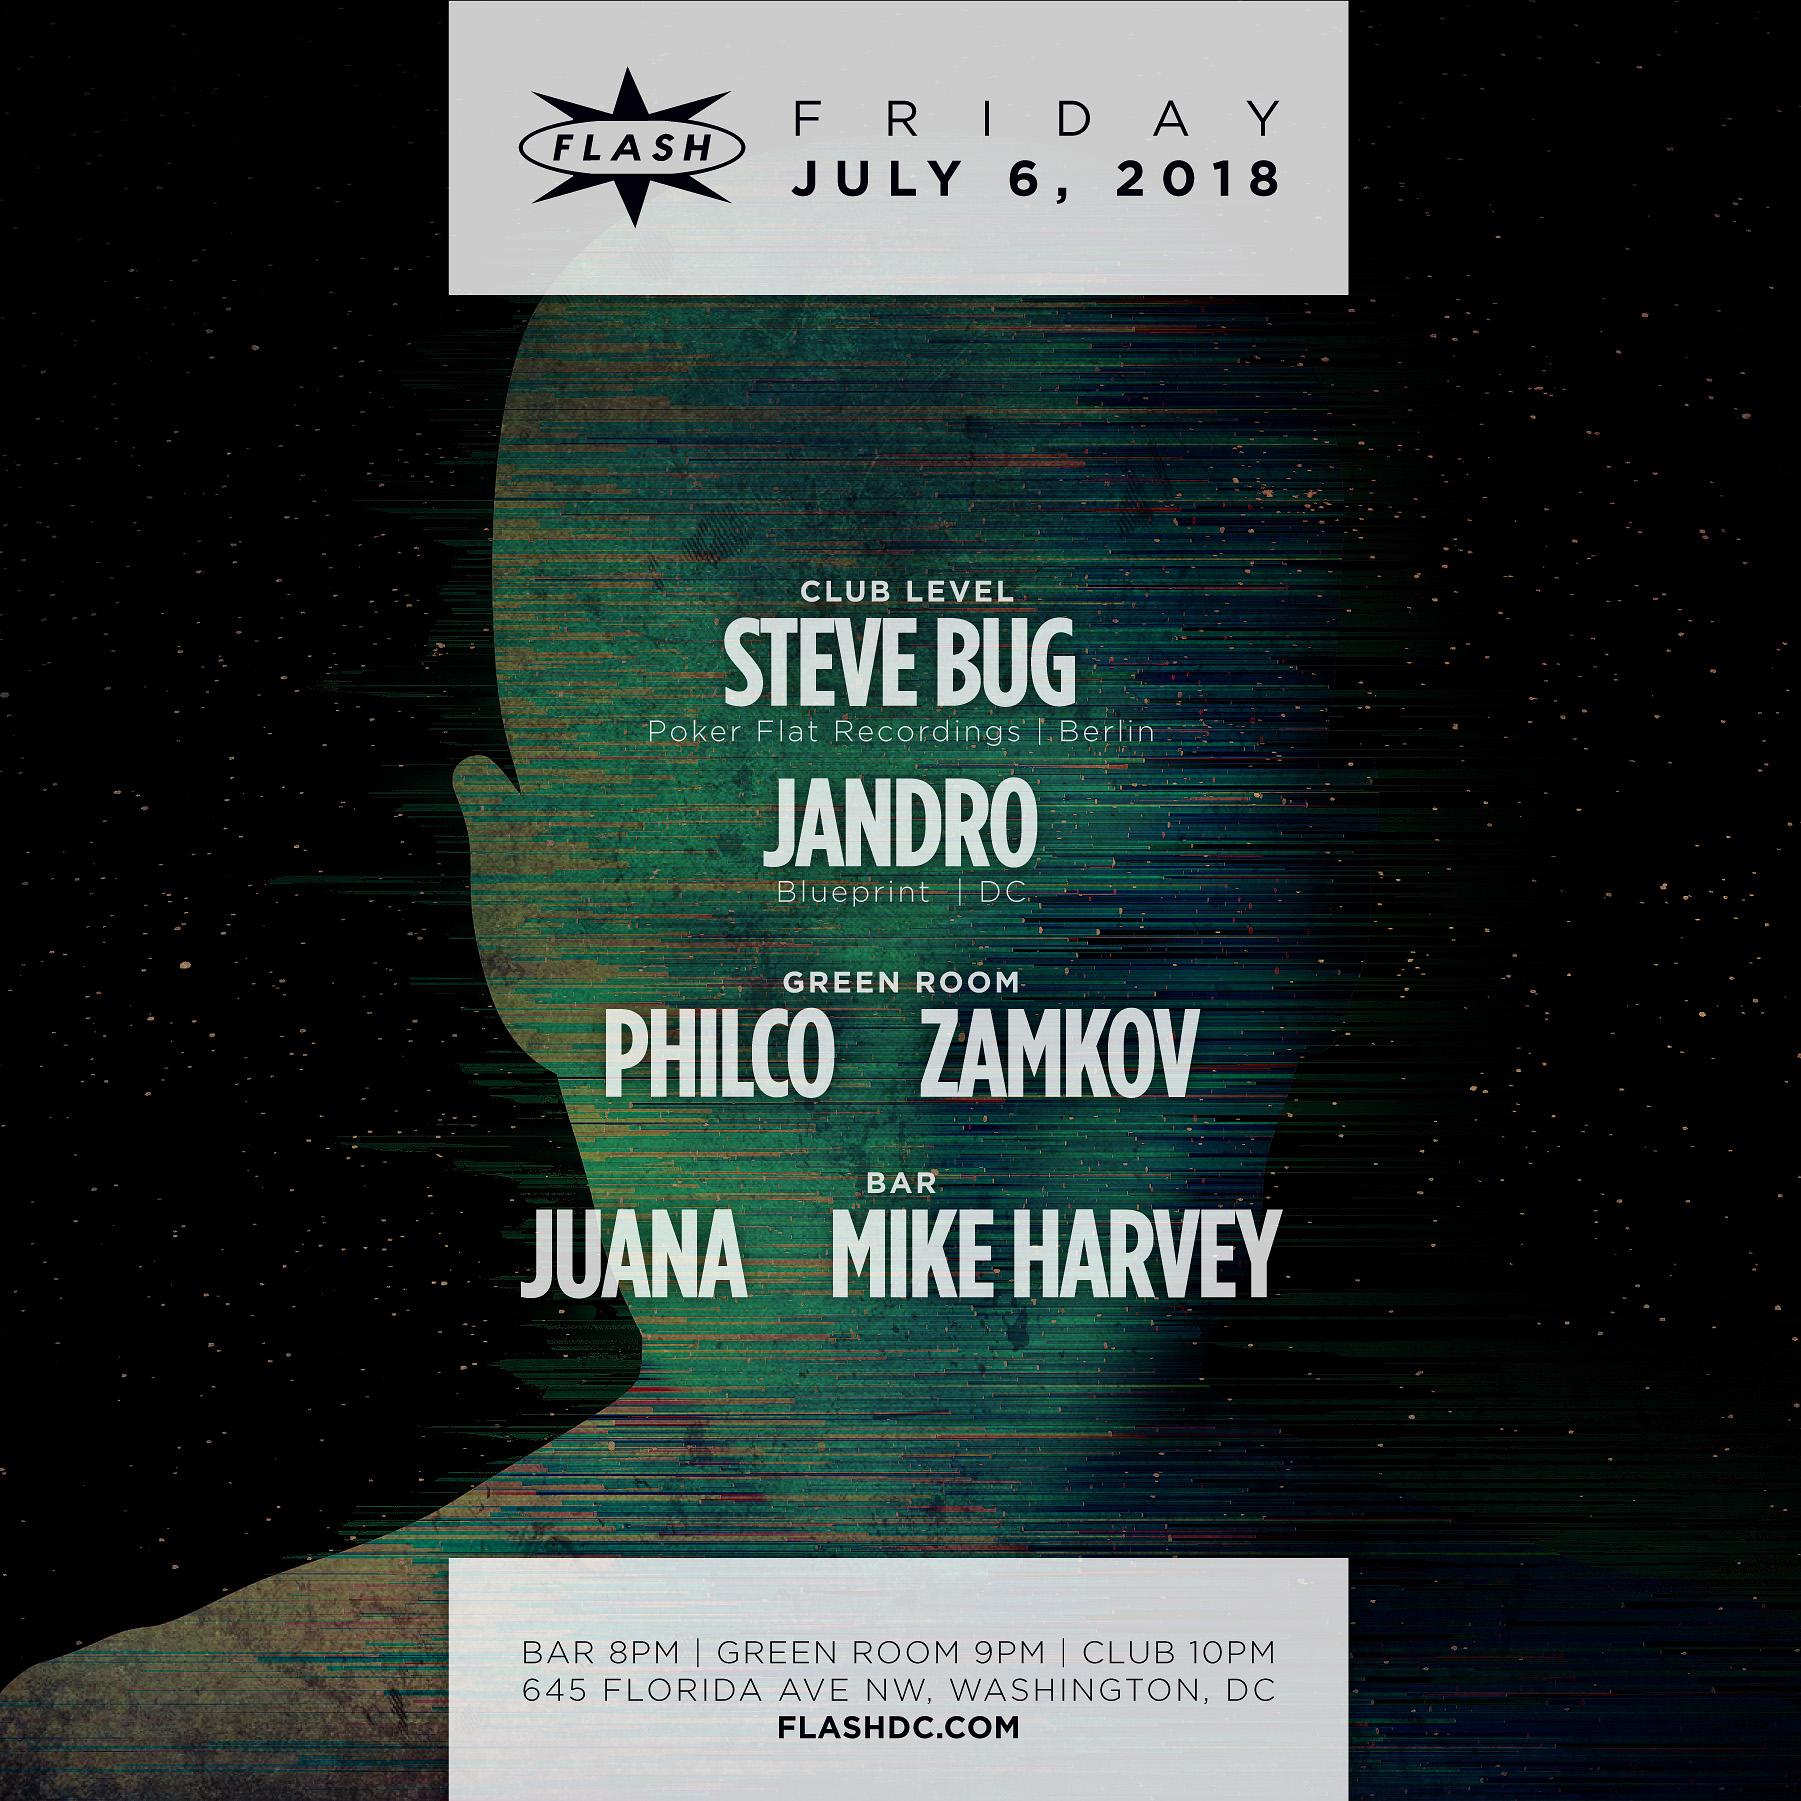 Steve Bug event thumbnail